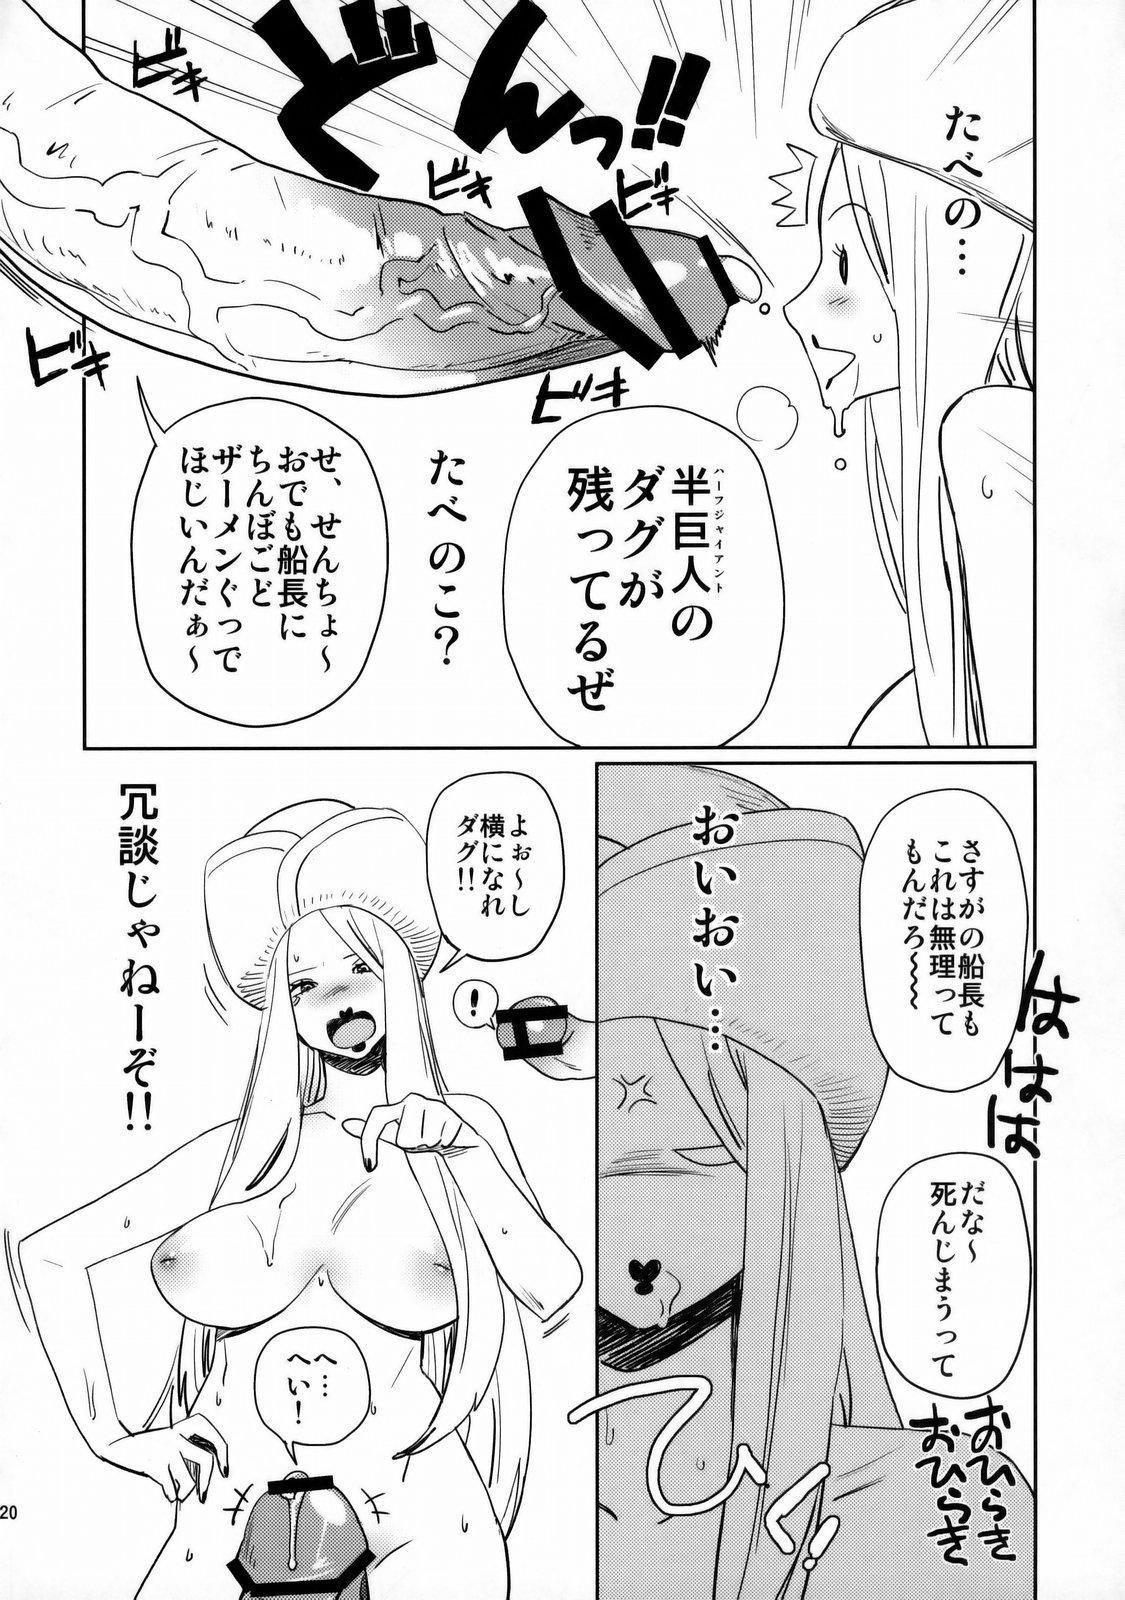 Abradeli Kamitaba No.05 140000000 18